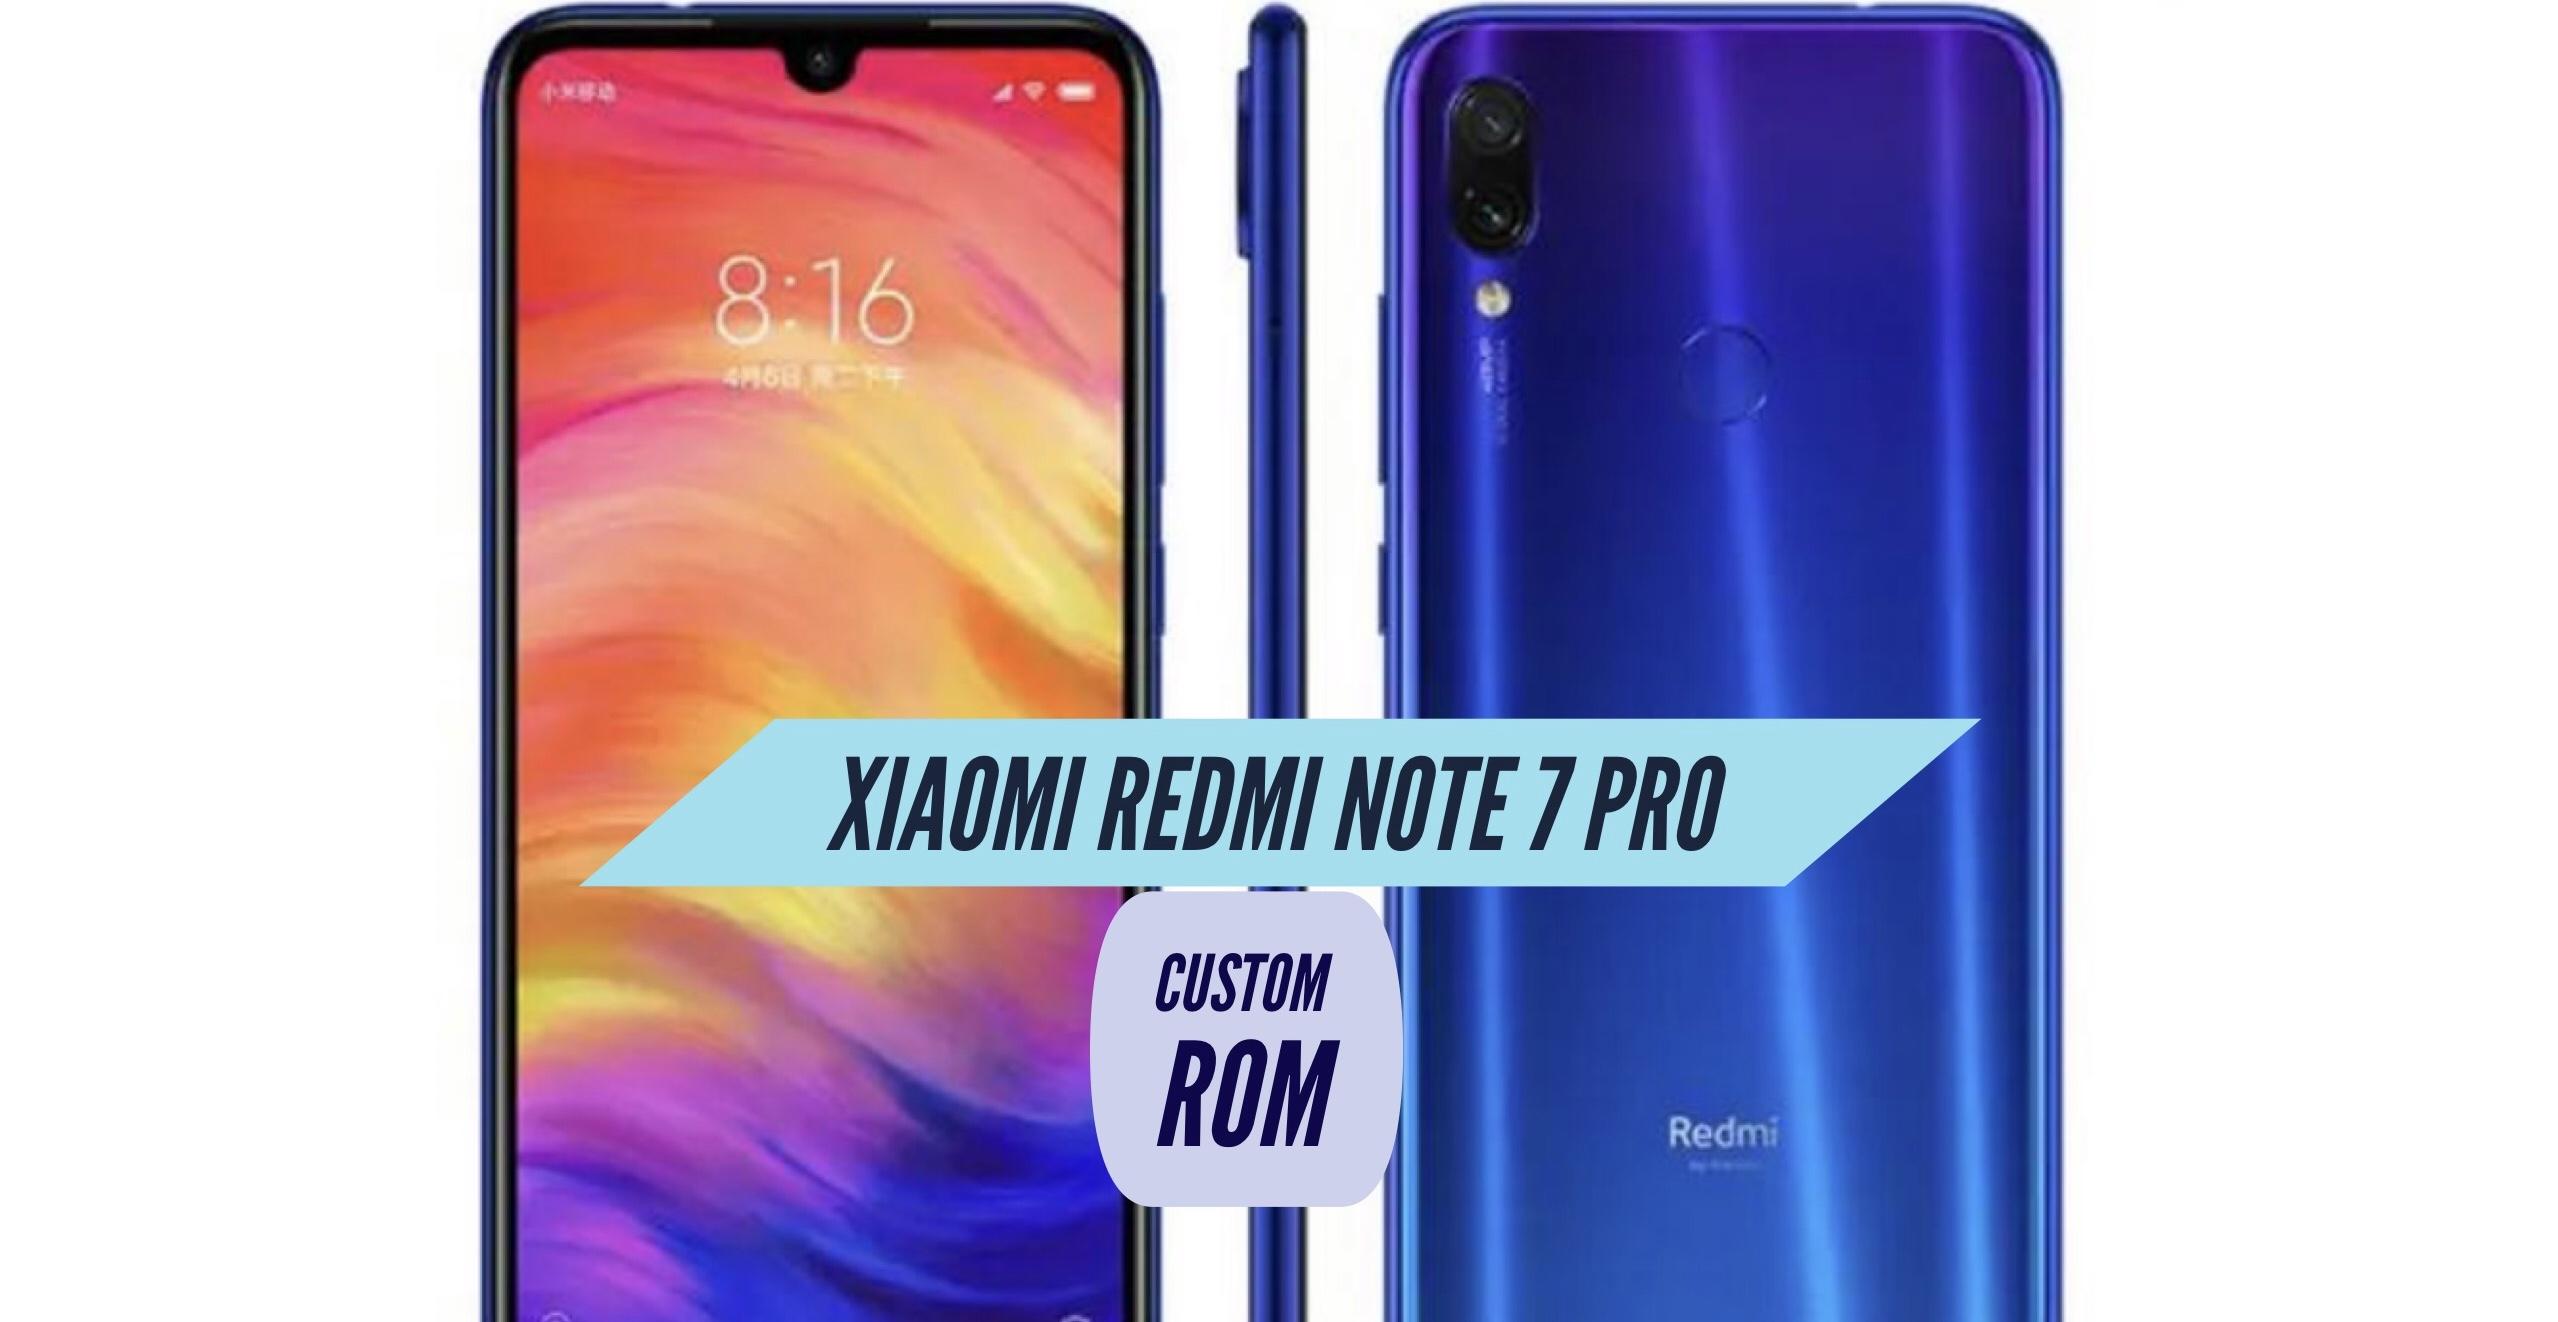 Redmi Note 7 Pro Custom ROM Installation - Two Easy METHODS!